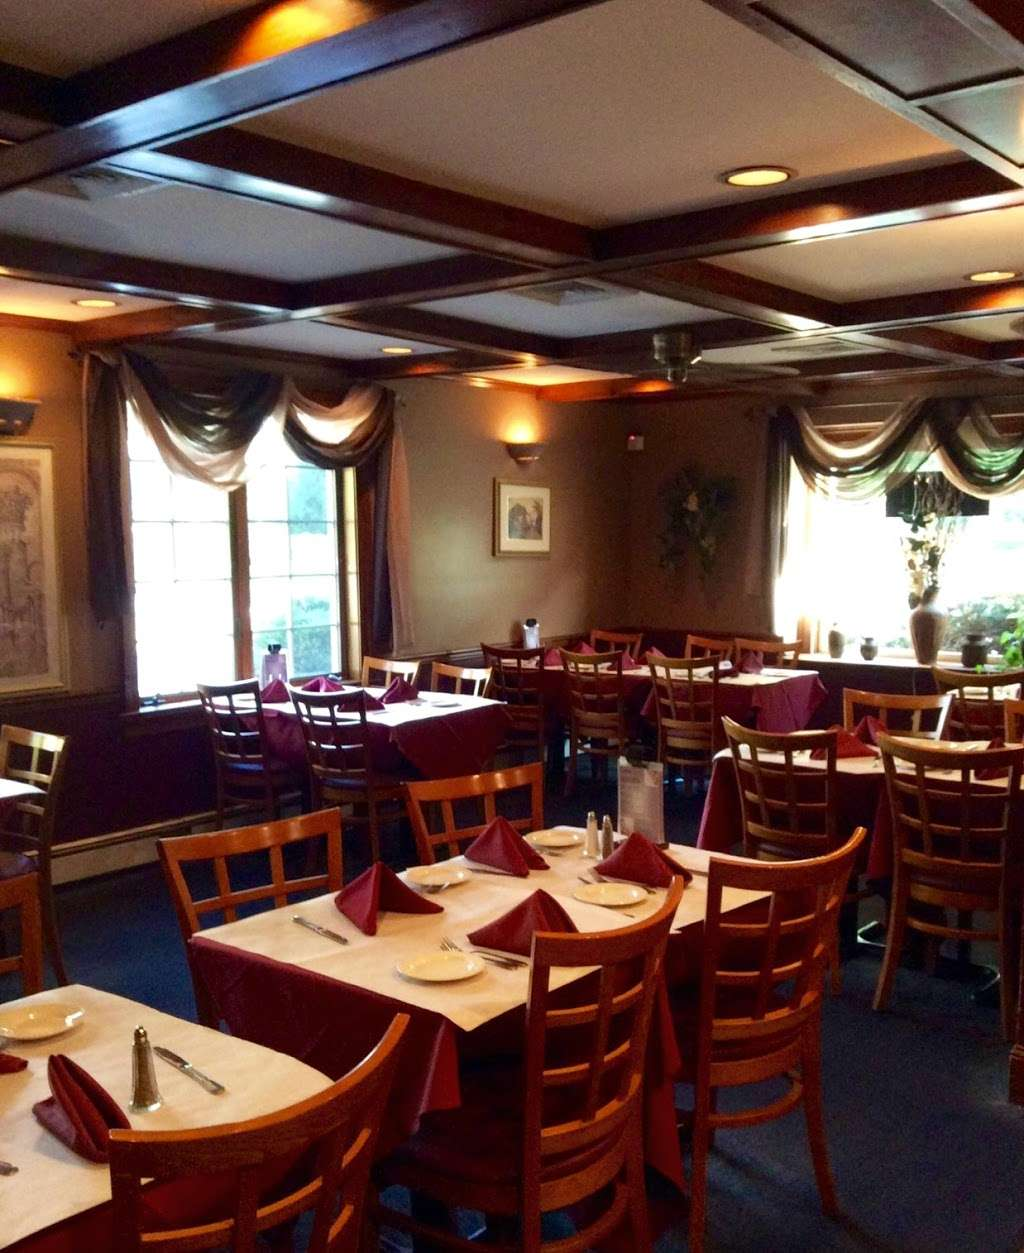 Cafe Rustica Restaurant 3188 Valley Rd Basking Ridge Nj 07920 Usa